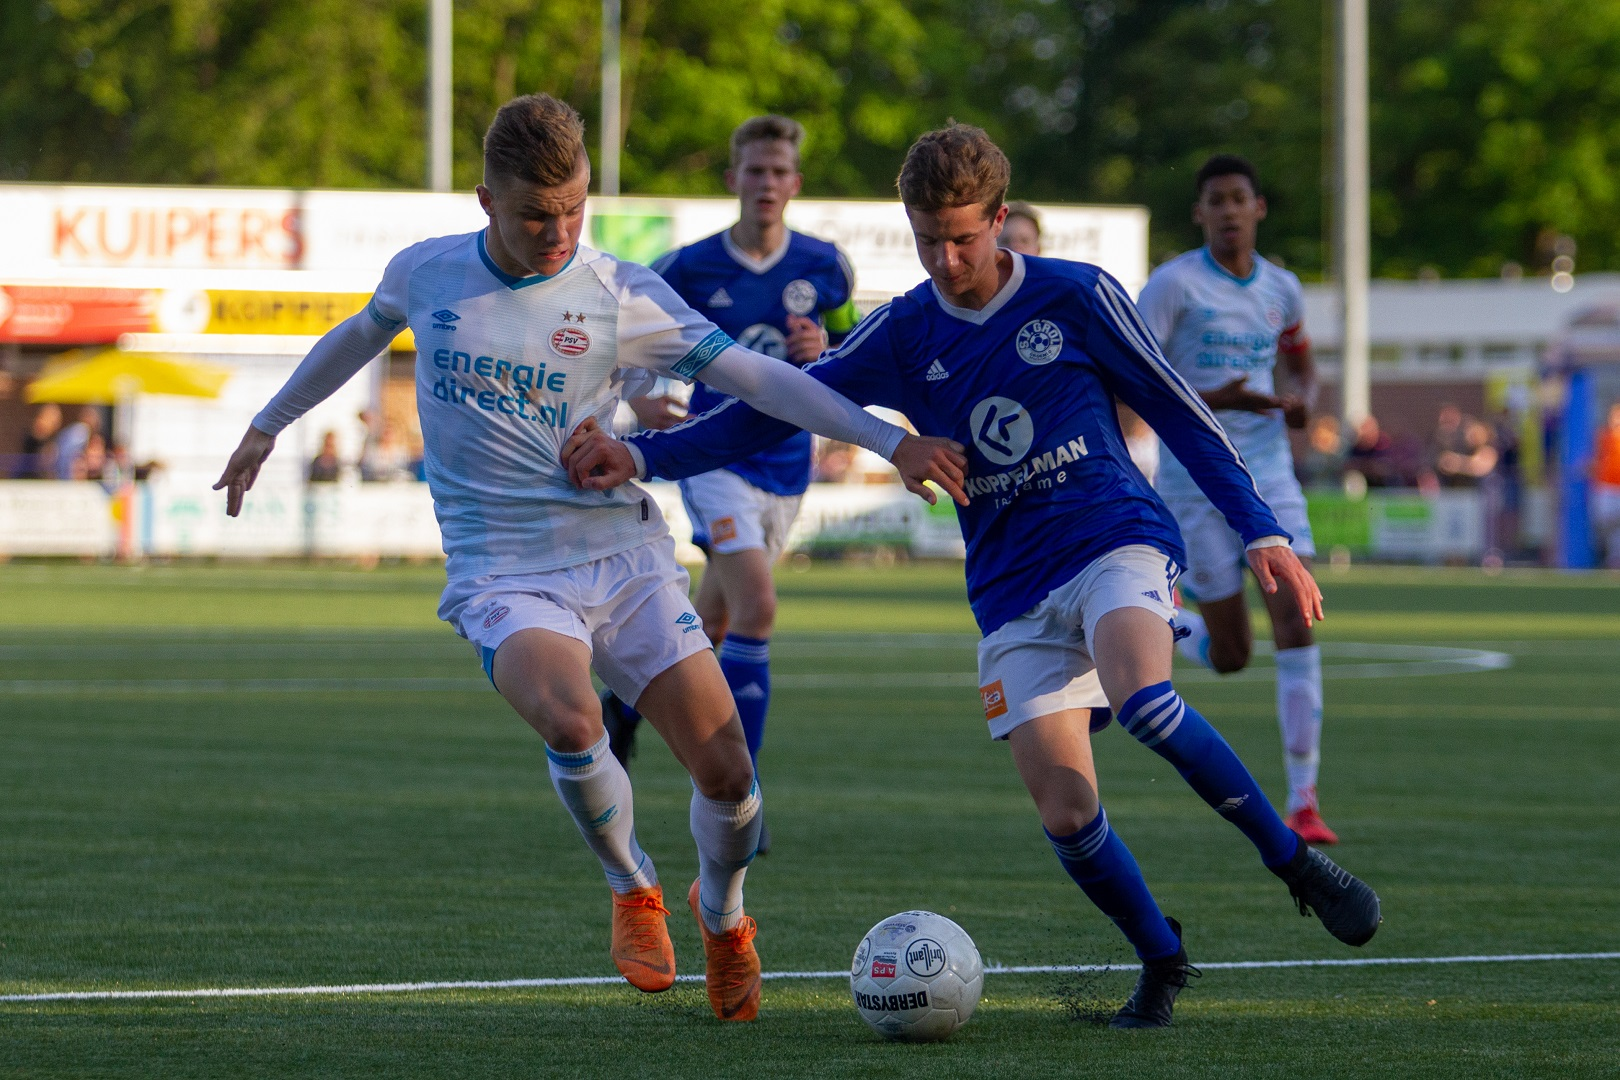 Marveld Tournament 2019 - SV Grol vs. PSV